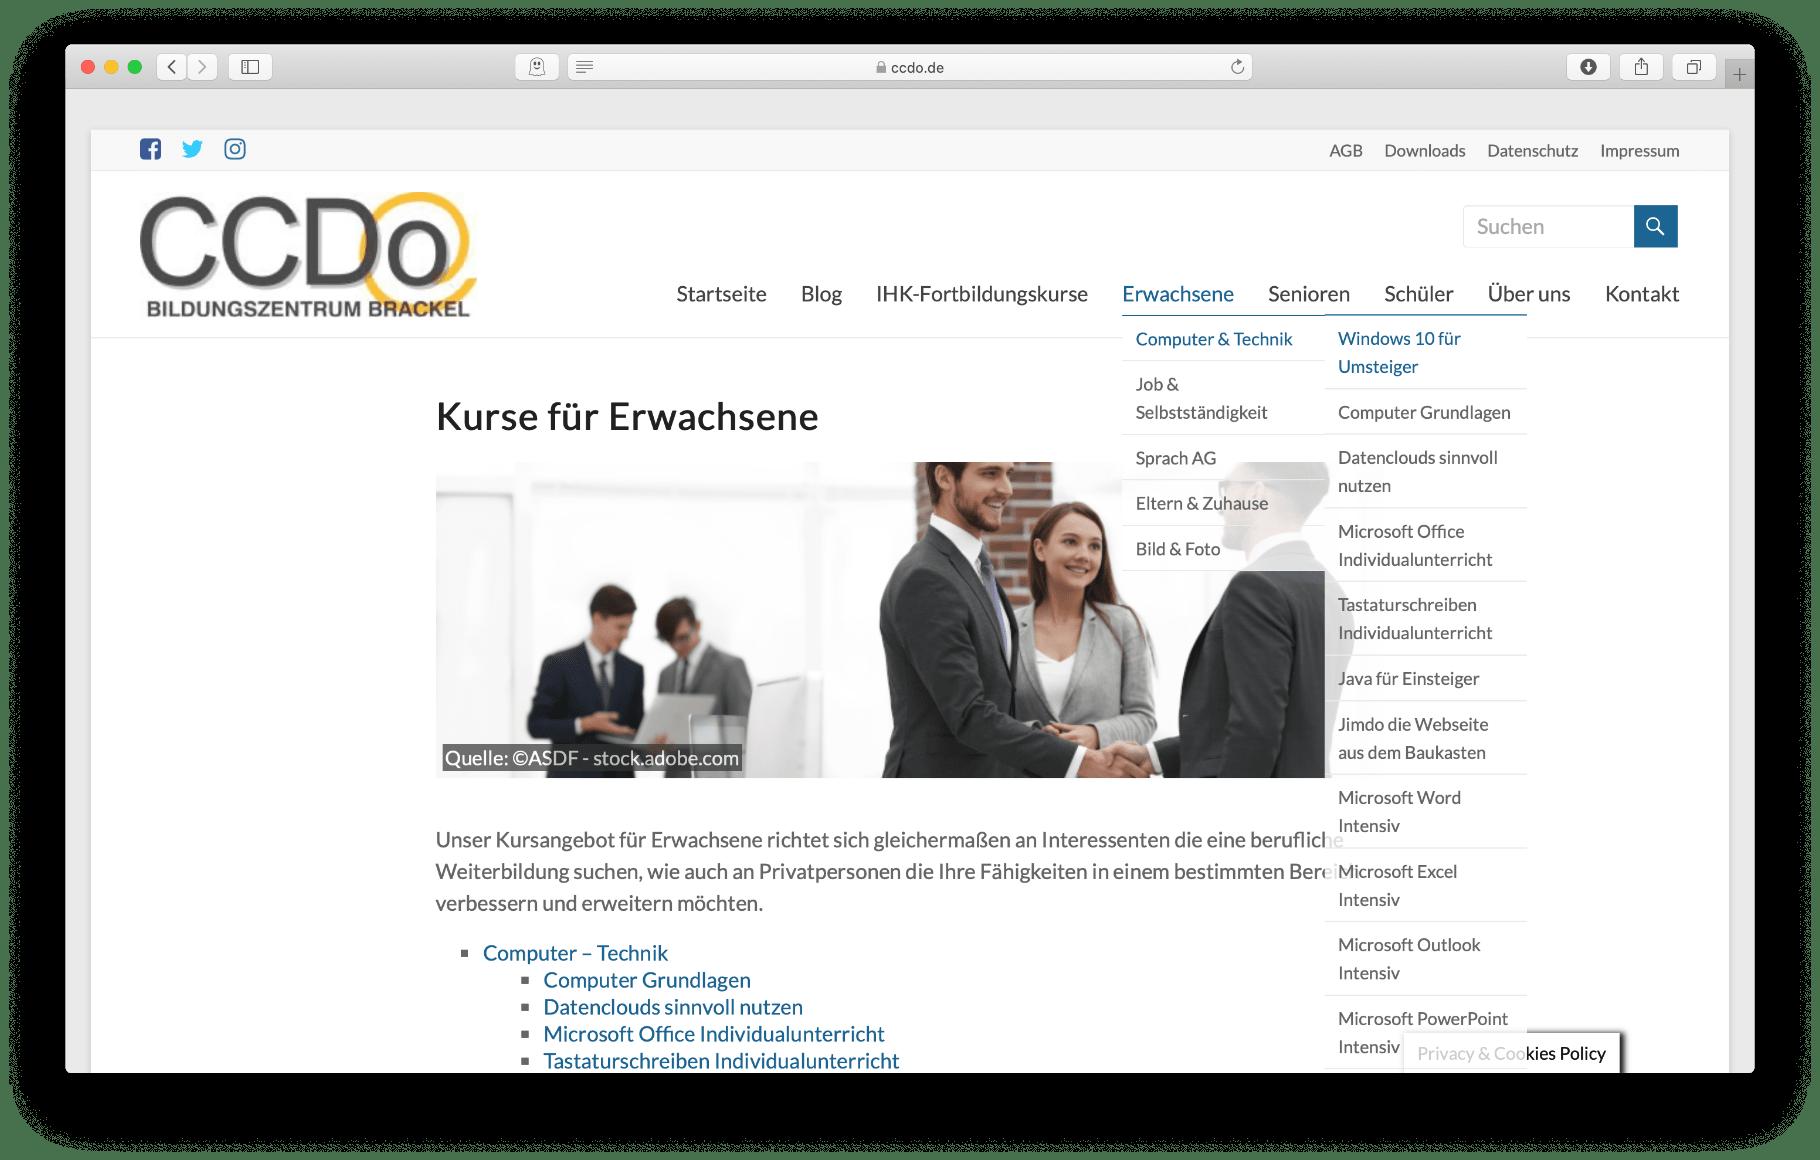 CCDo - Homepage